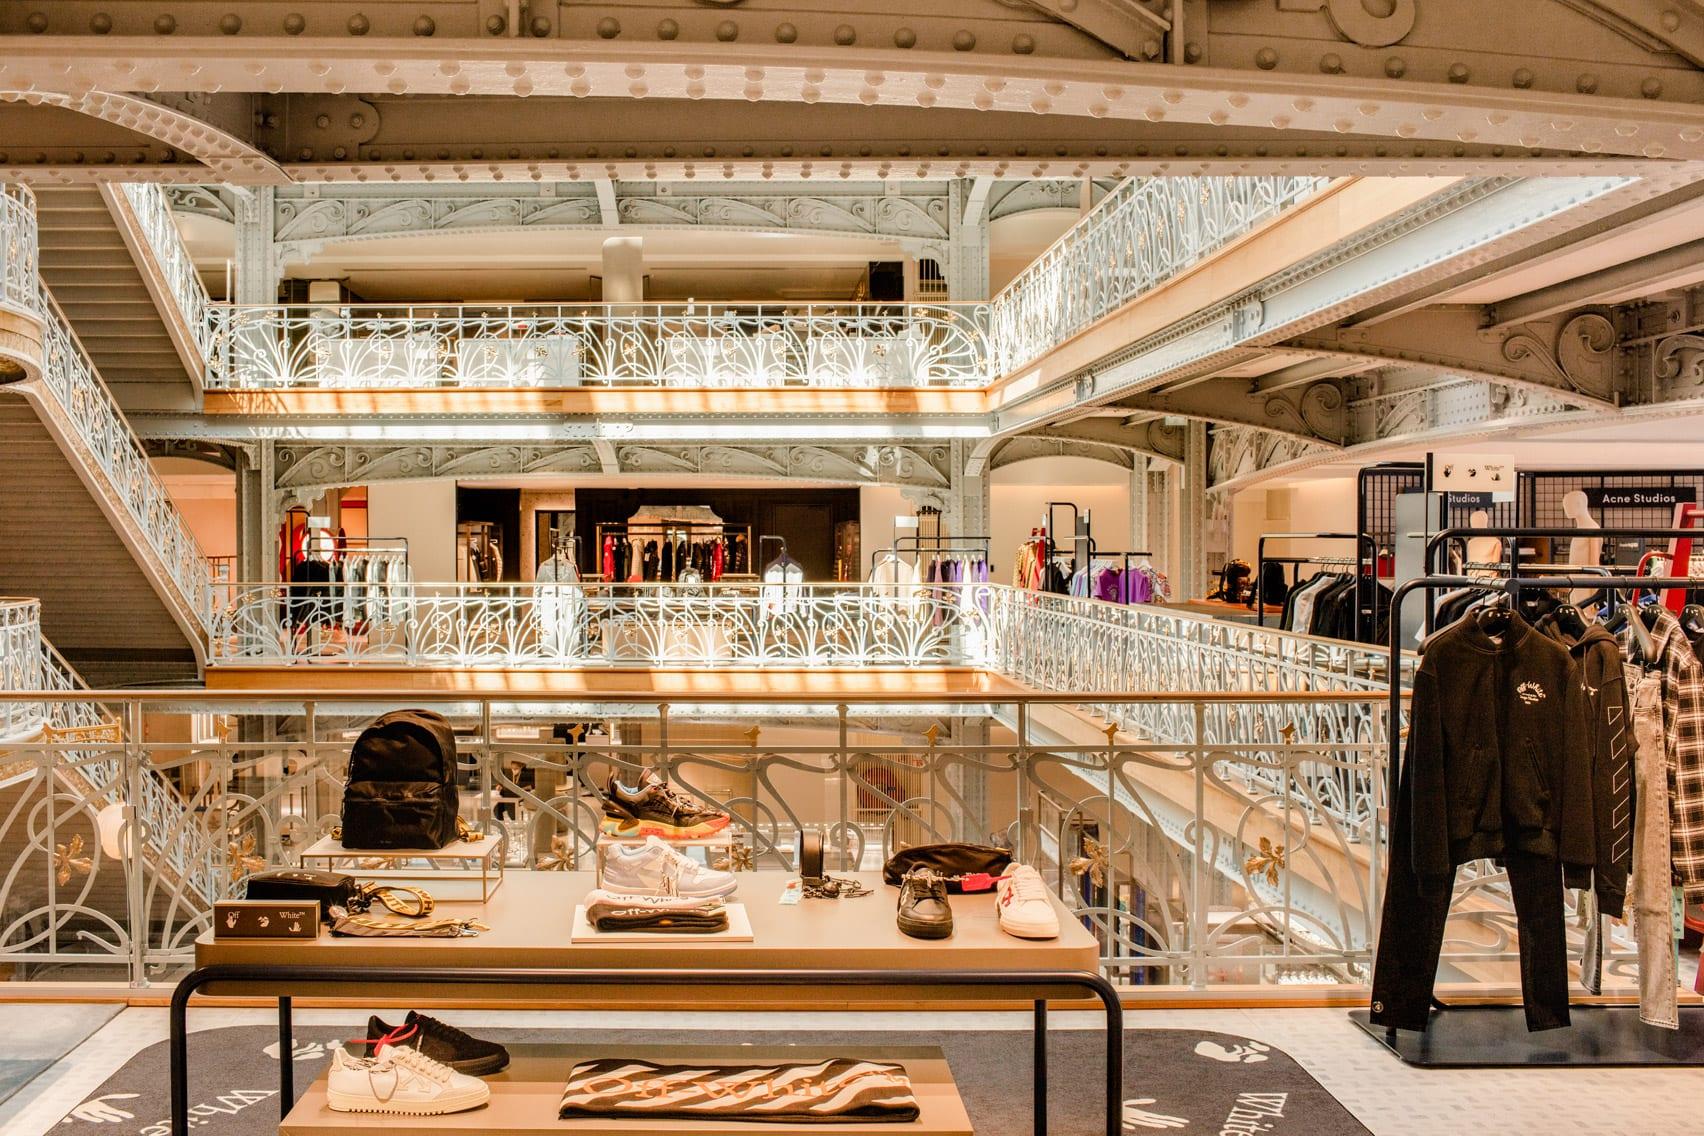 la-samaritaine-sanaa-architecture-renovations-paris-france_dezeen_1704_col_19.jpg